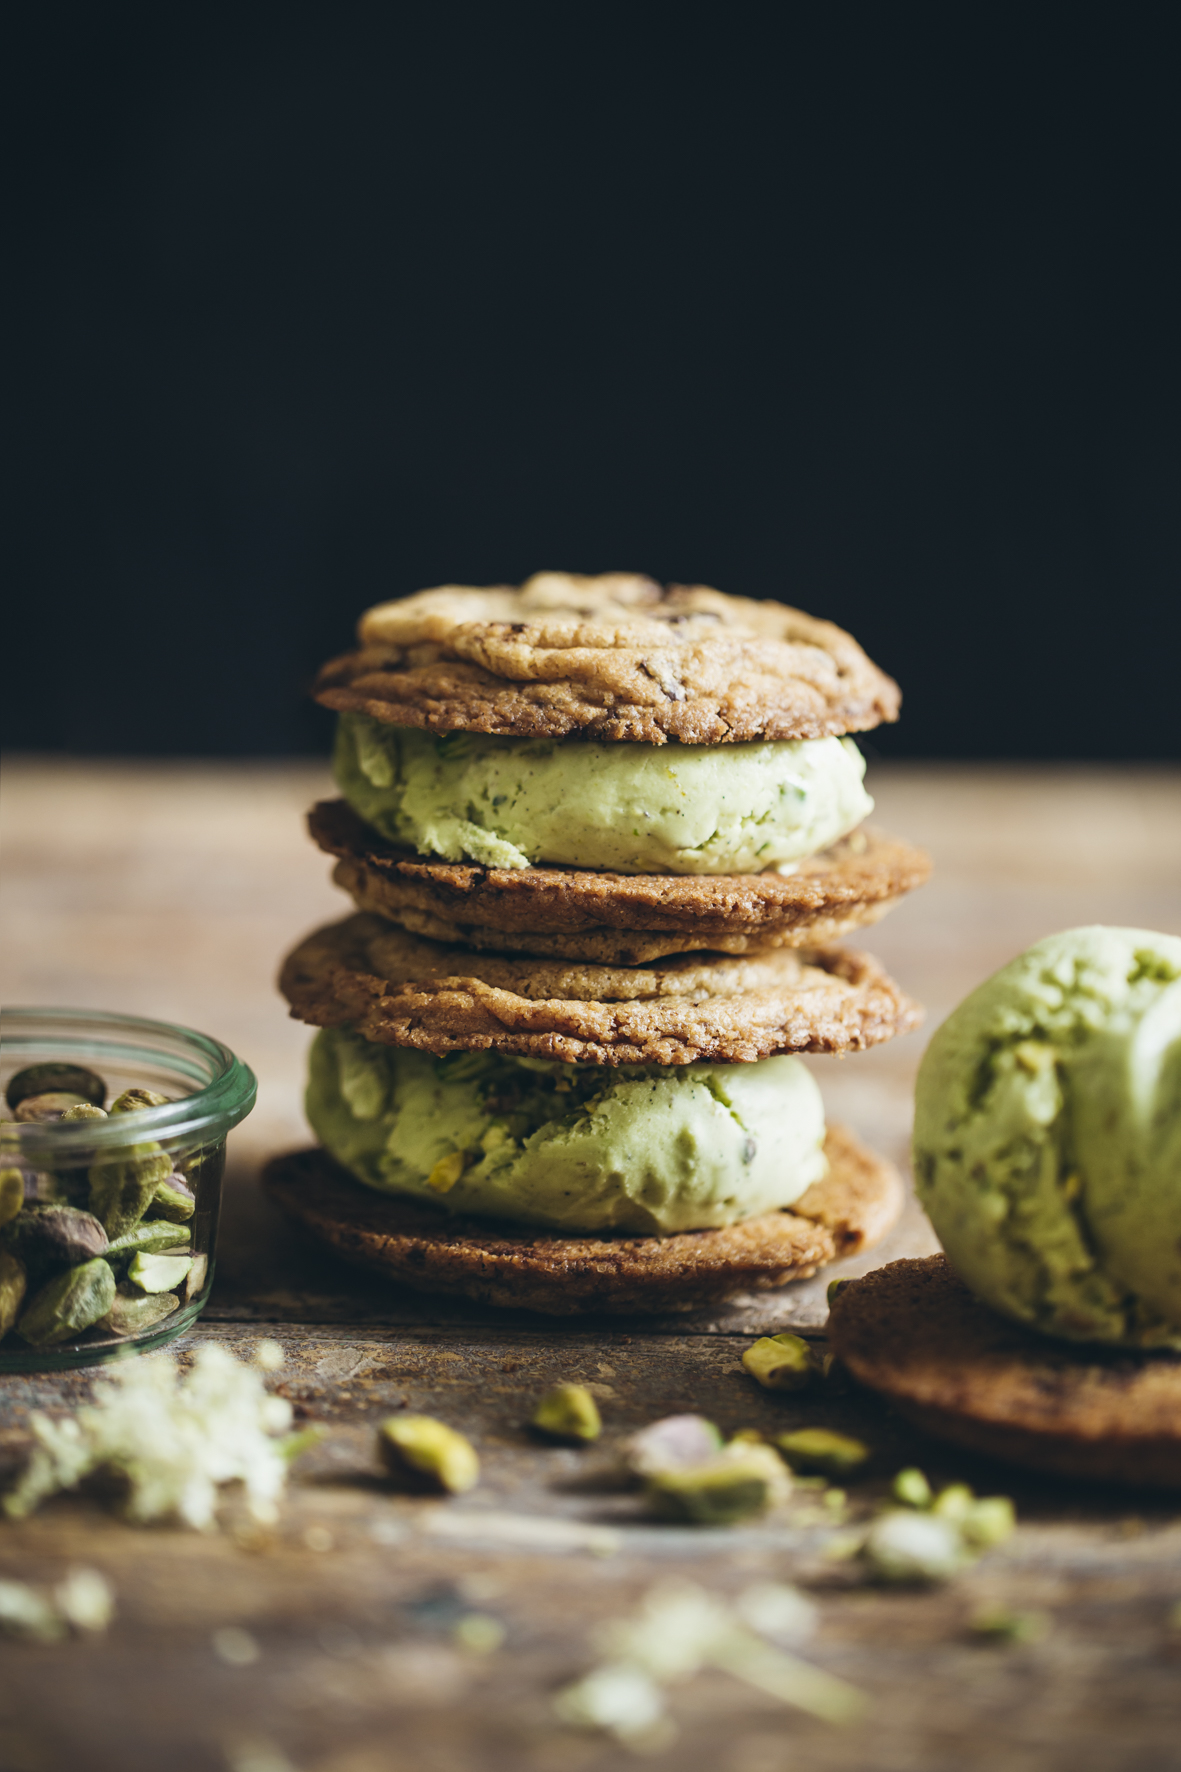 Cookies ice cream sandwich à la pistache ©Sandrine Saadi